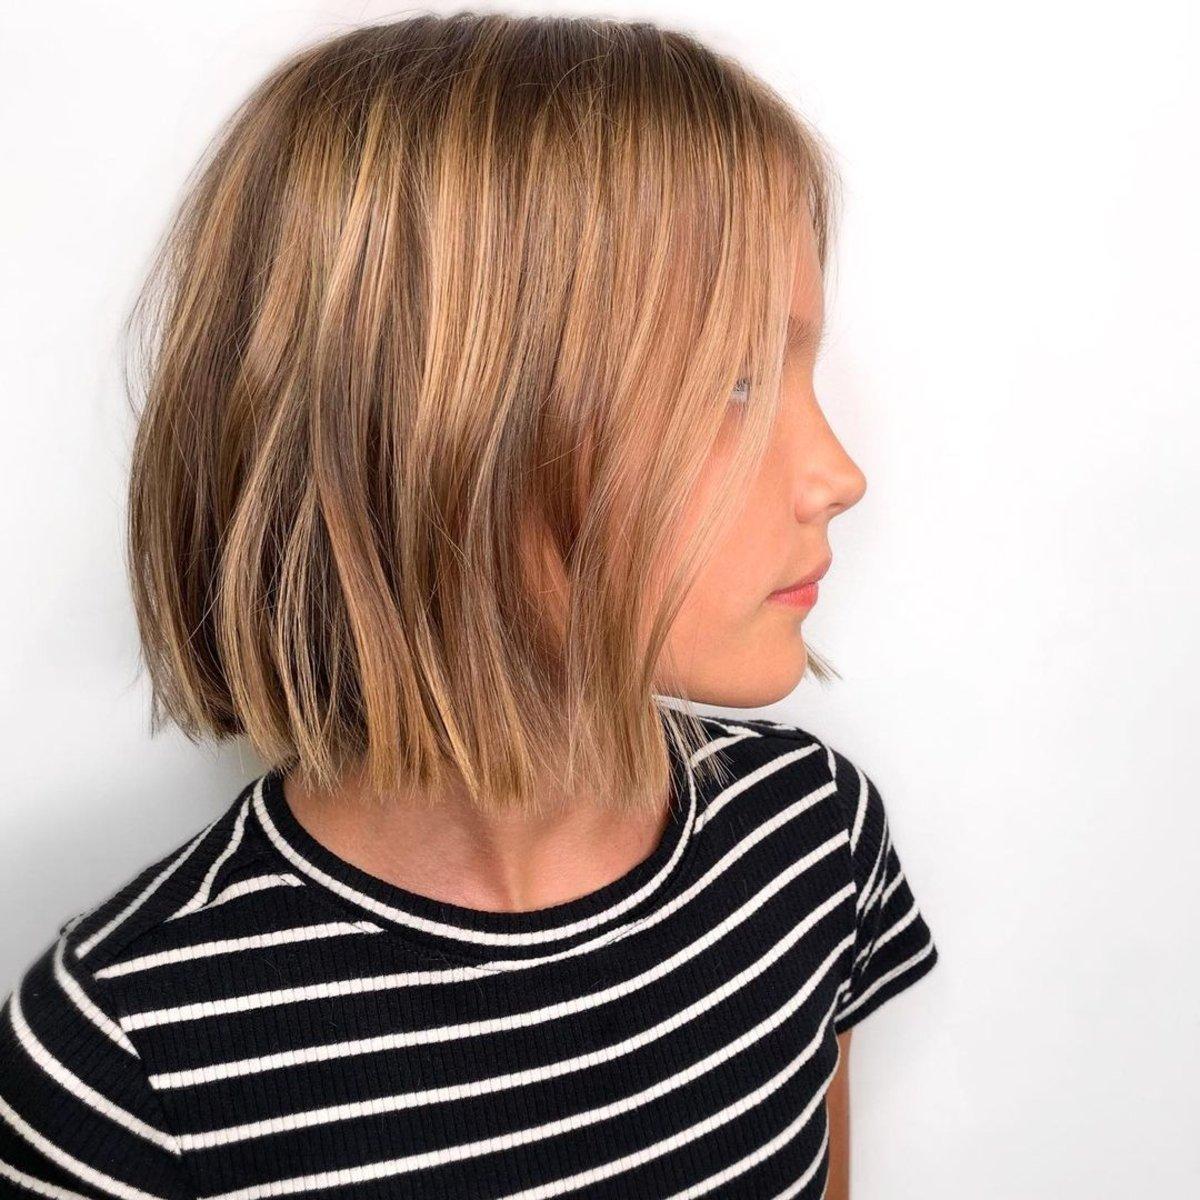 Corte de cuello corto para niñas con cabello fino